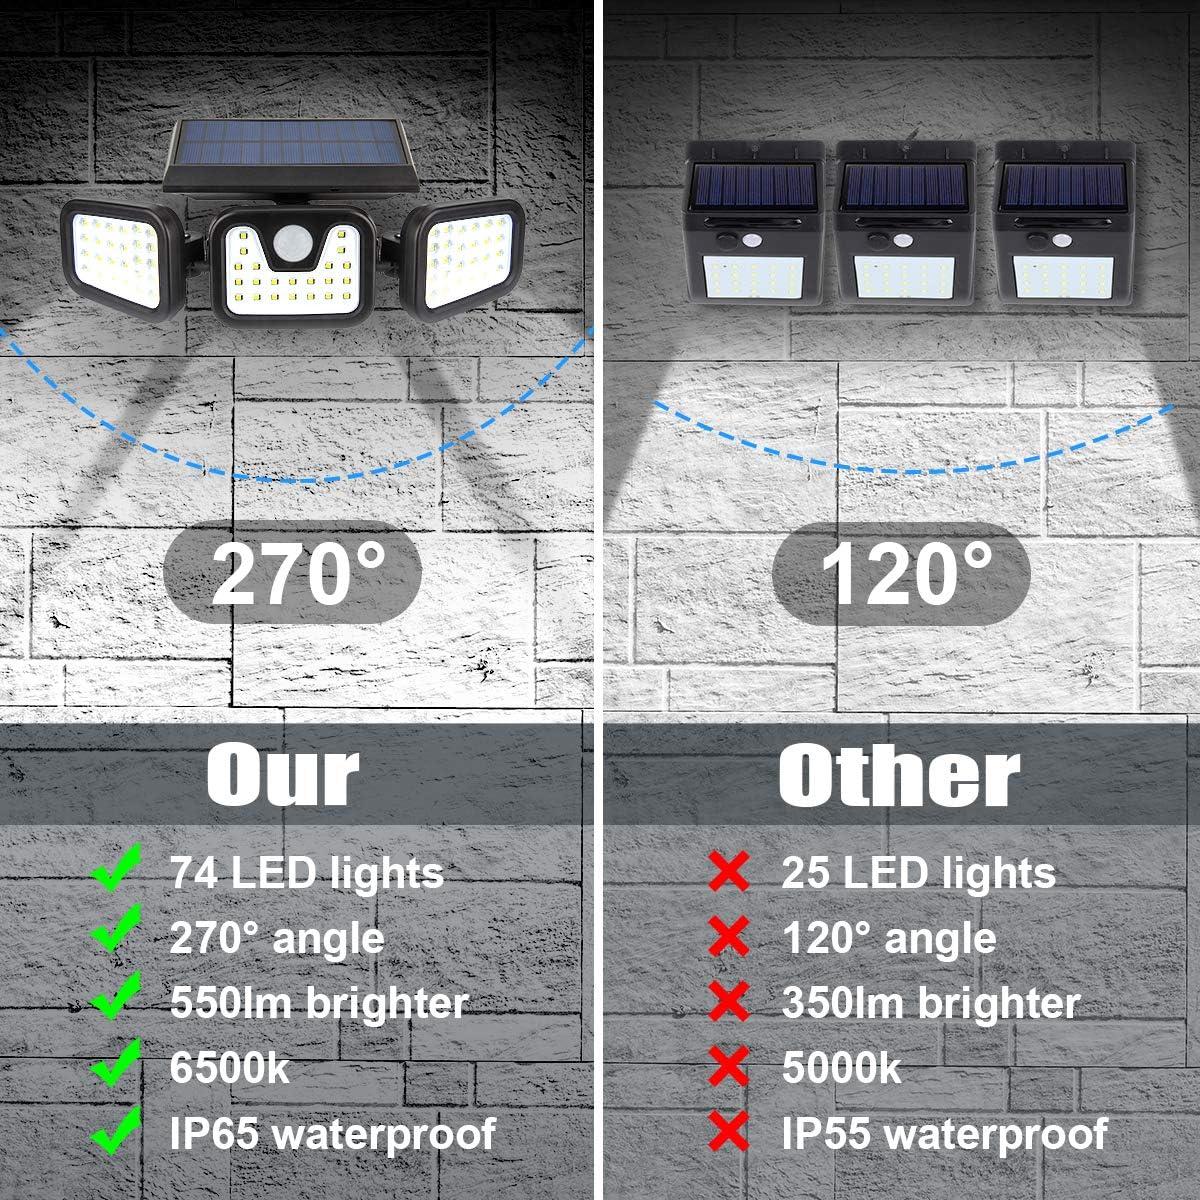 Solar Security Lights, ZEVEZ 3 Heads 74LED Solar Motion Sensor Lights Outdoor, Solar Lights Outdoor 270 Illumination 780LM 6500K IP65 Waterproof for Front Door, Patio Yard and Garage 2 Pack